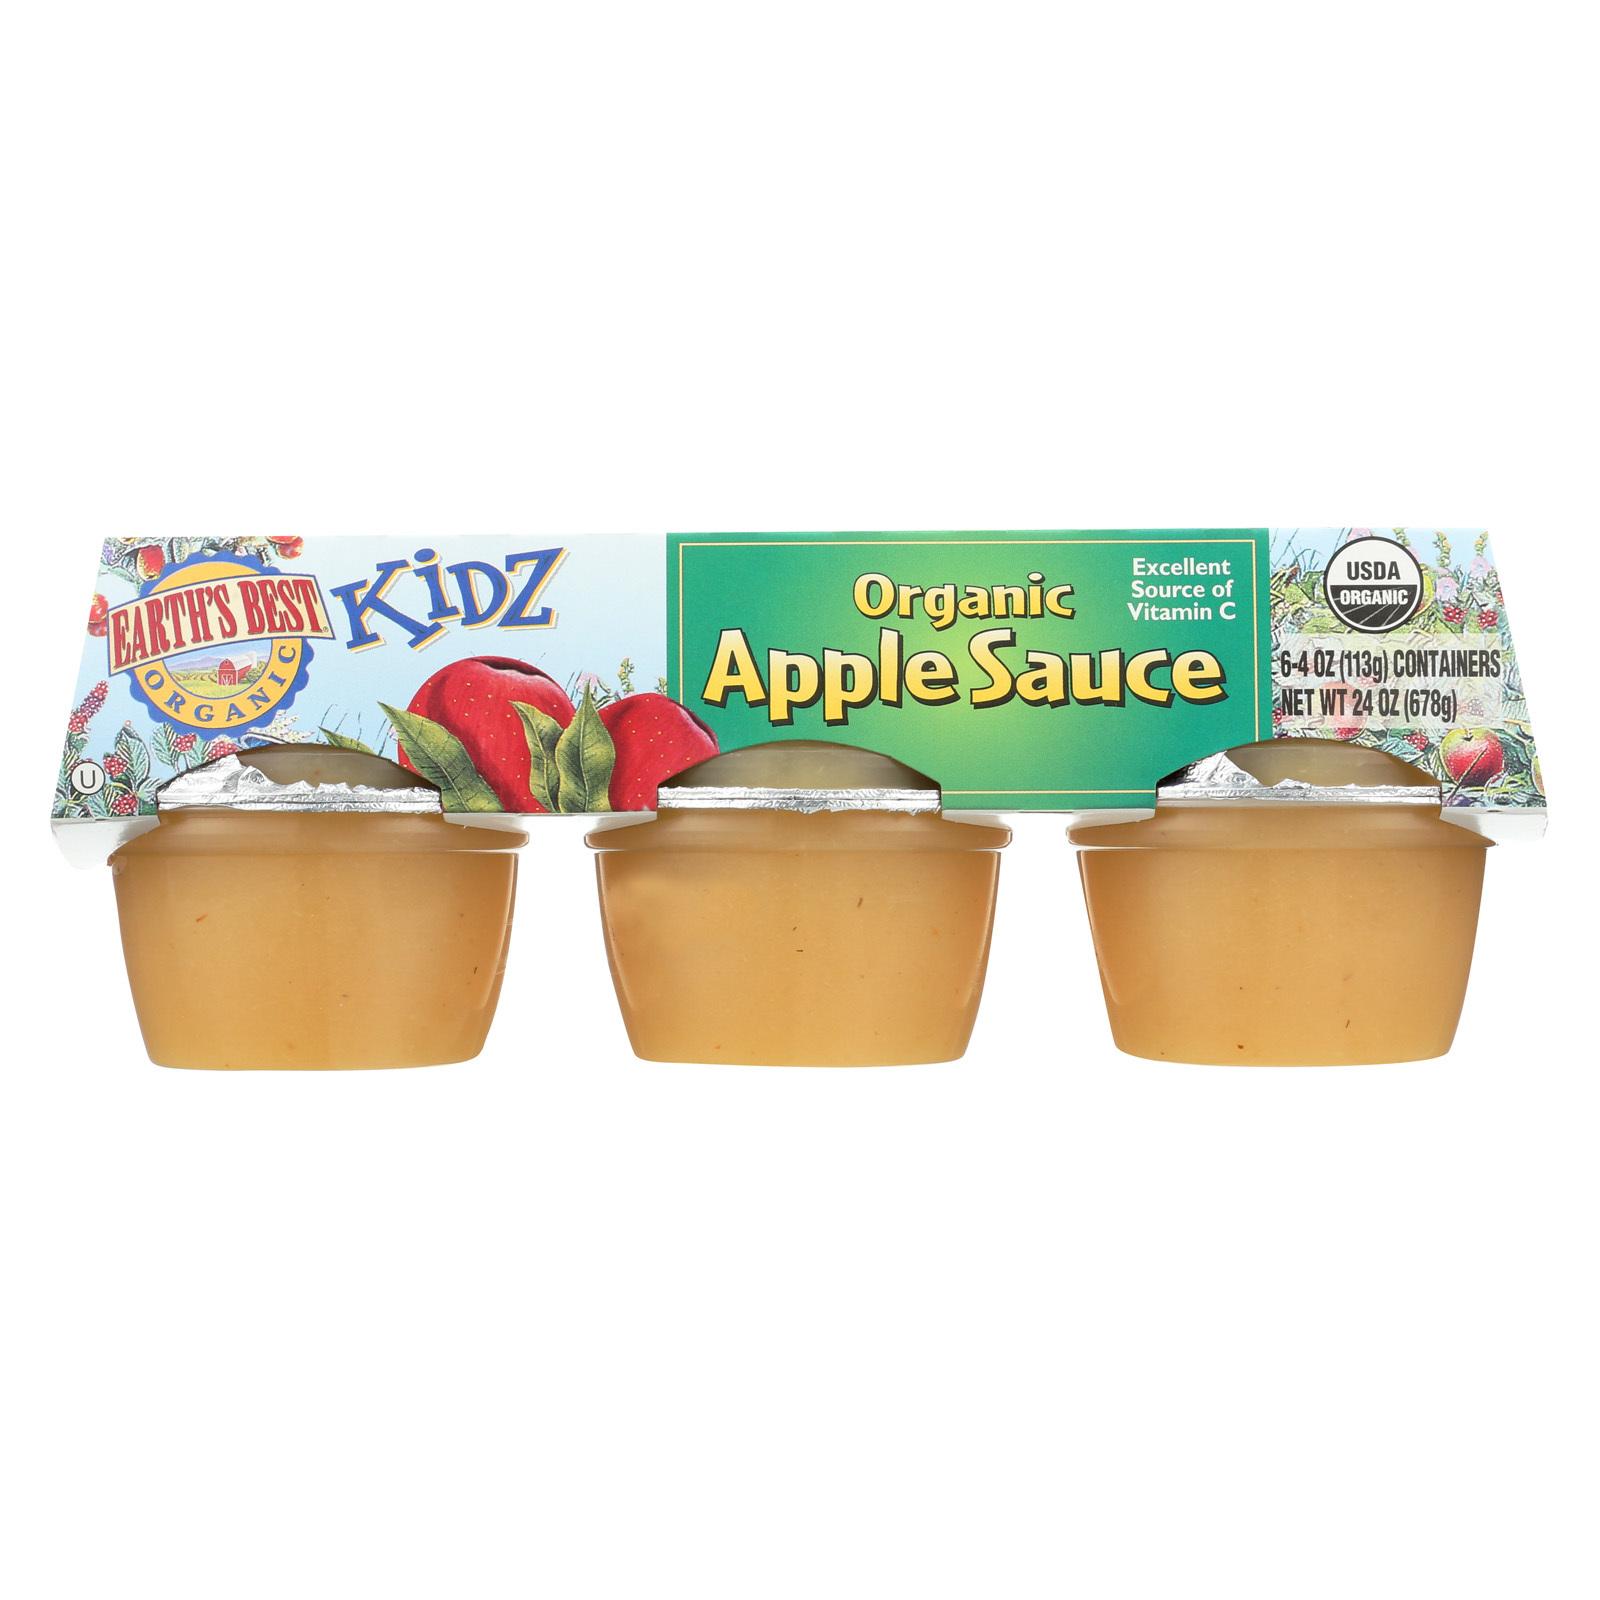 Earth's Best Kidz Organic Apple Sauce Cups - Case of 12 - 4 oz.